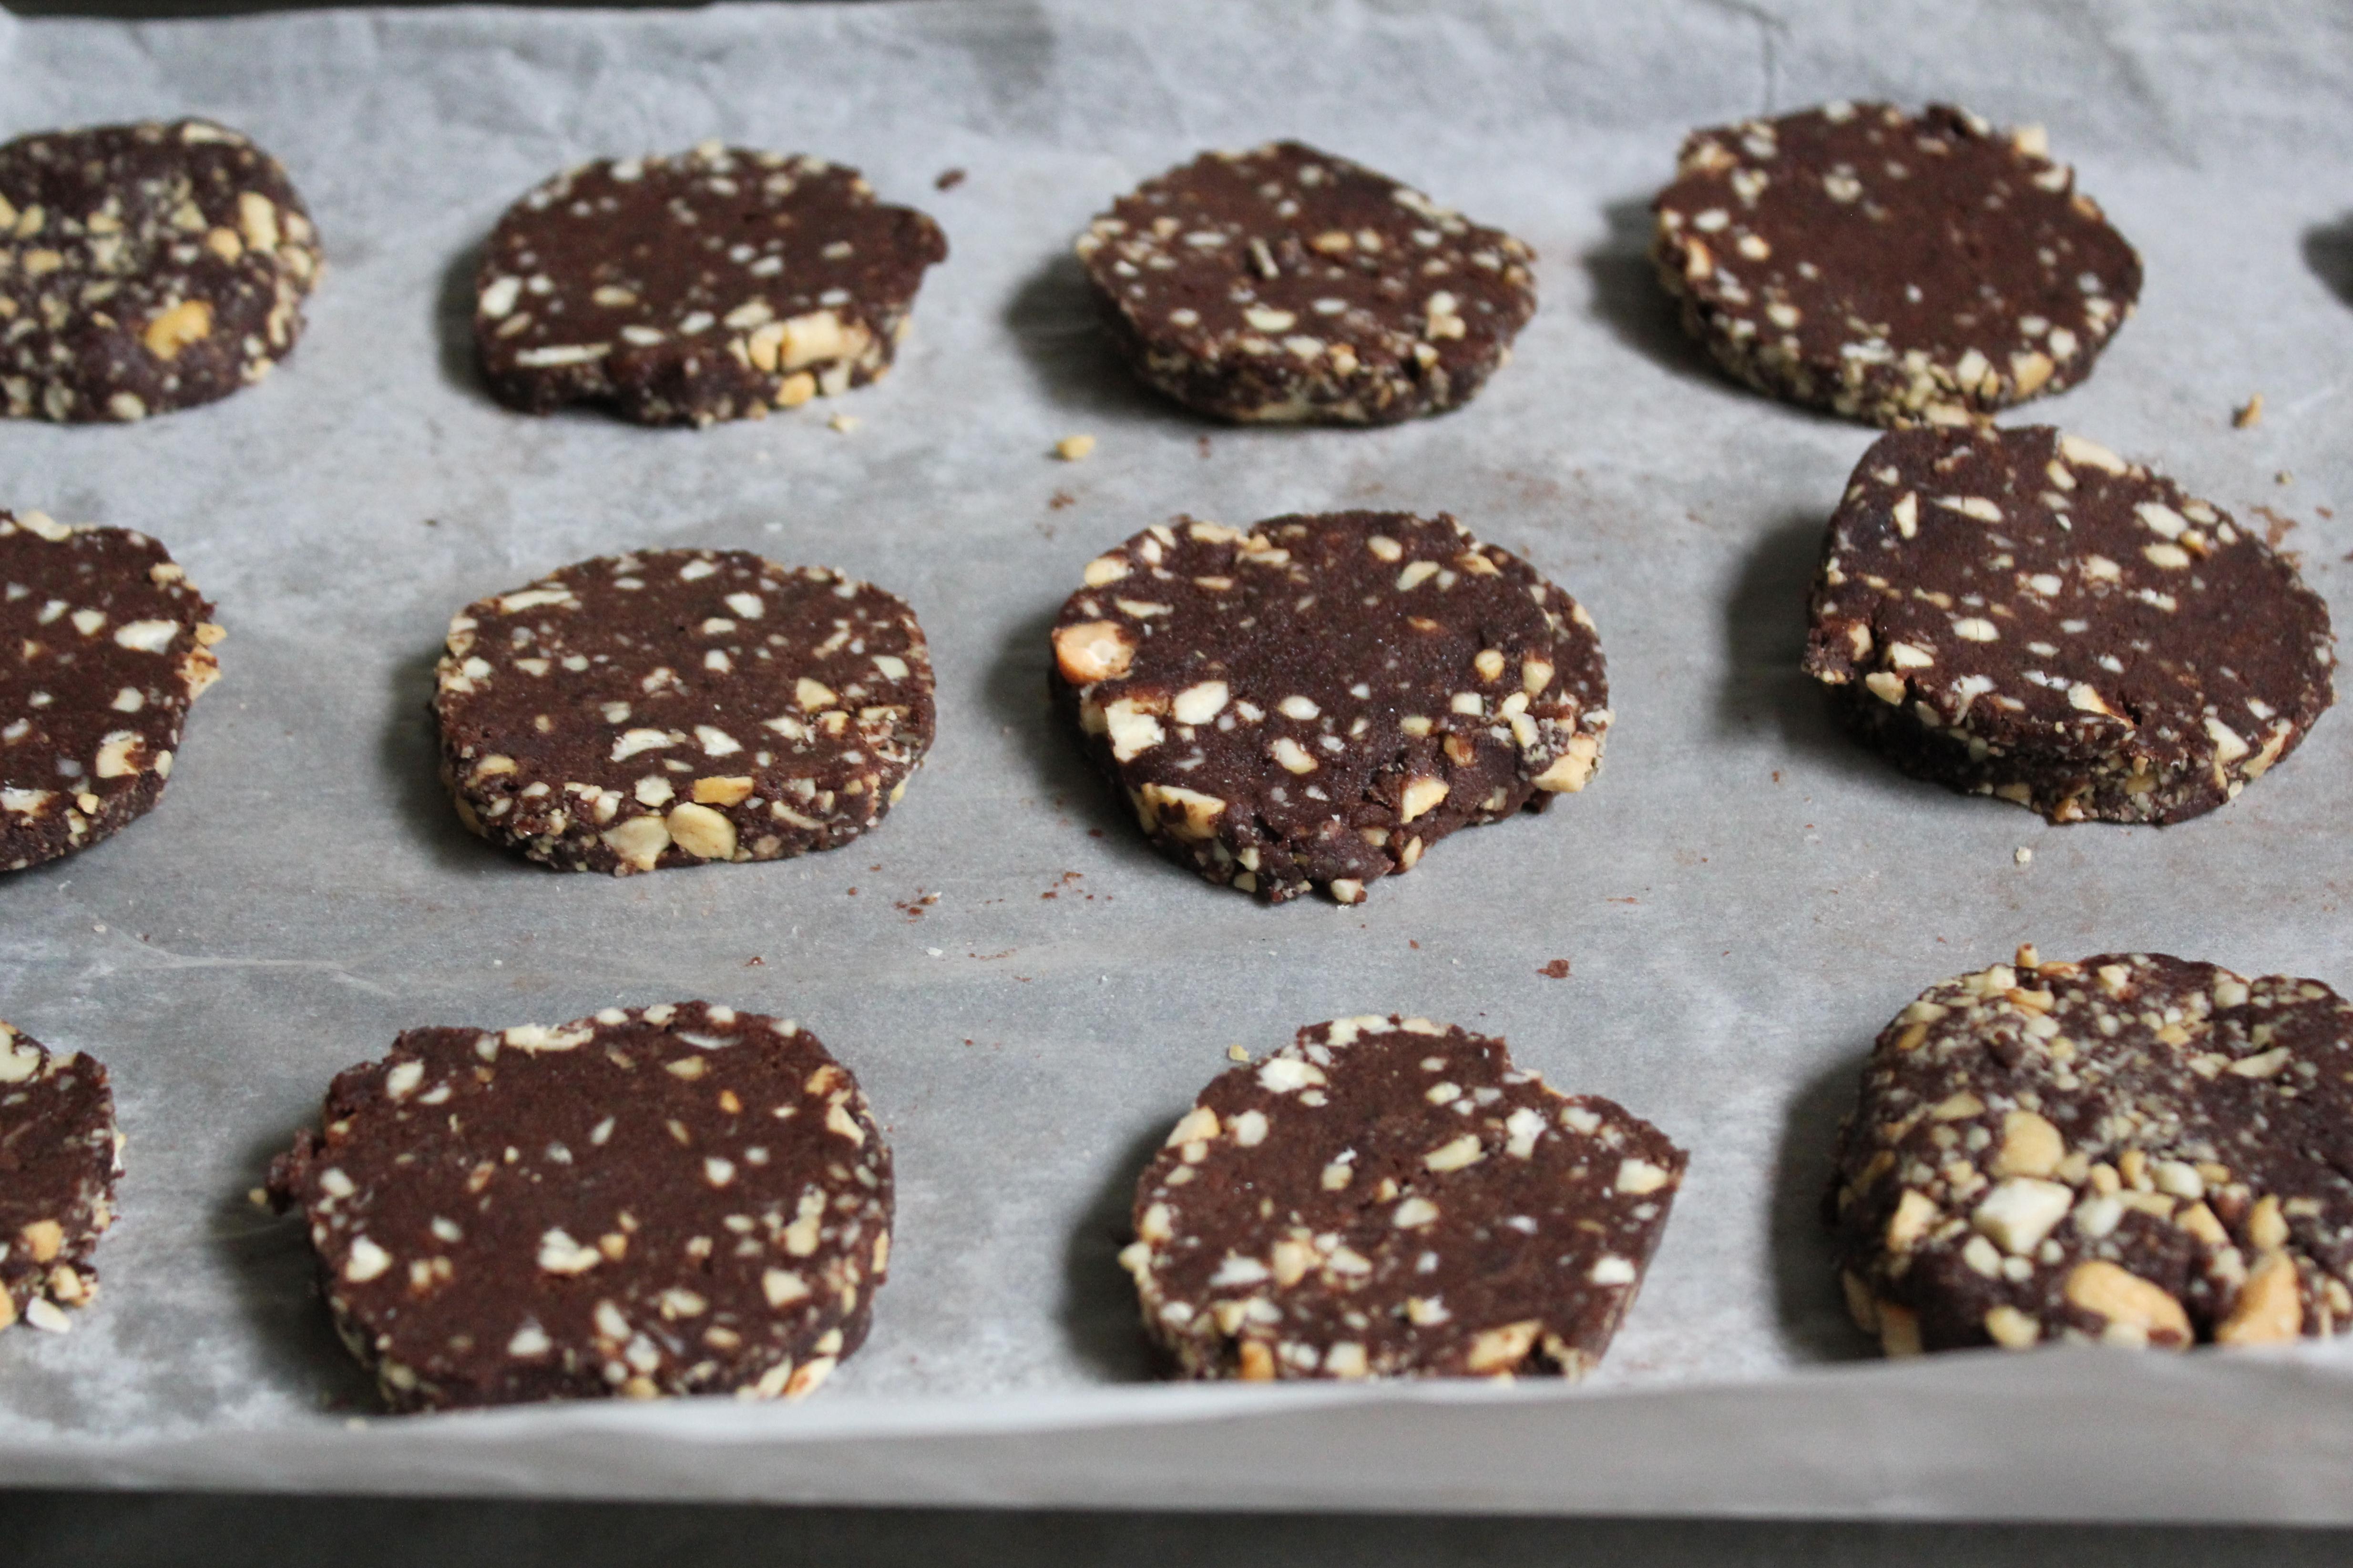 Chocolate Cashew Cookies Sweets And Brains Milo 2 Cokelat 42 Then